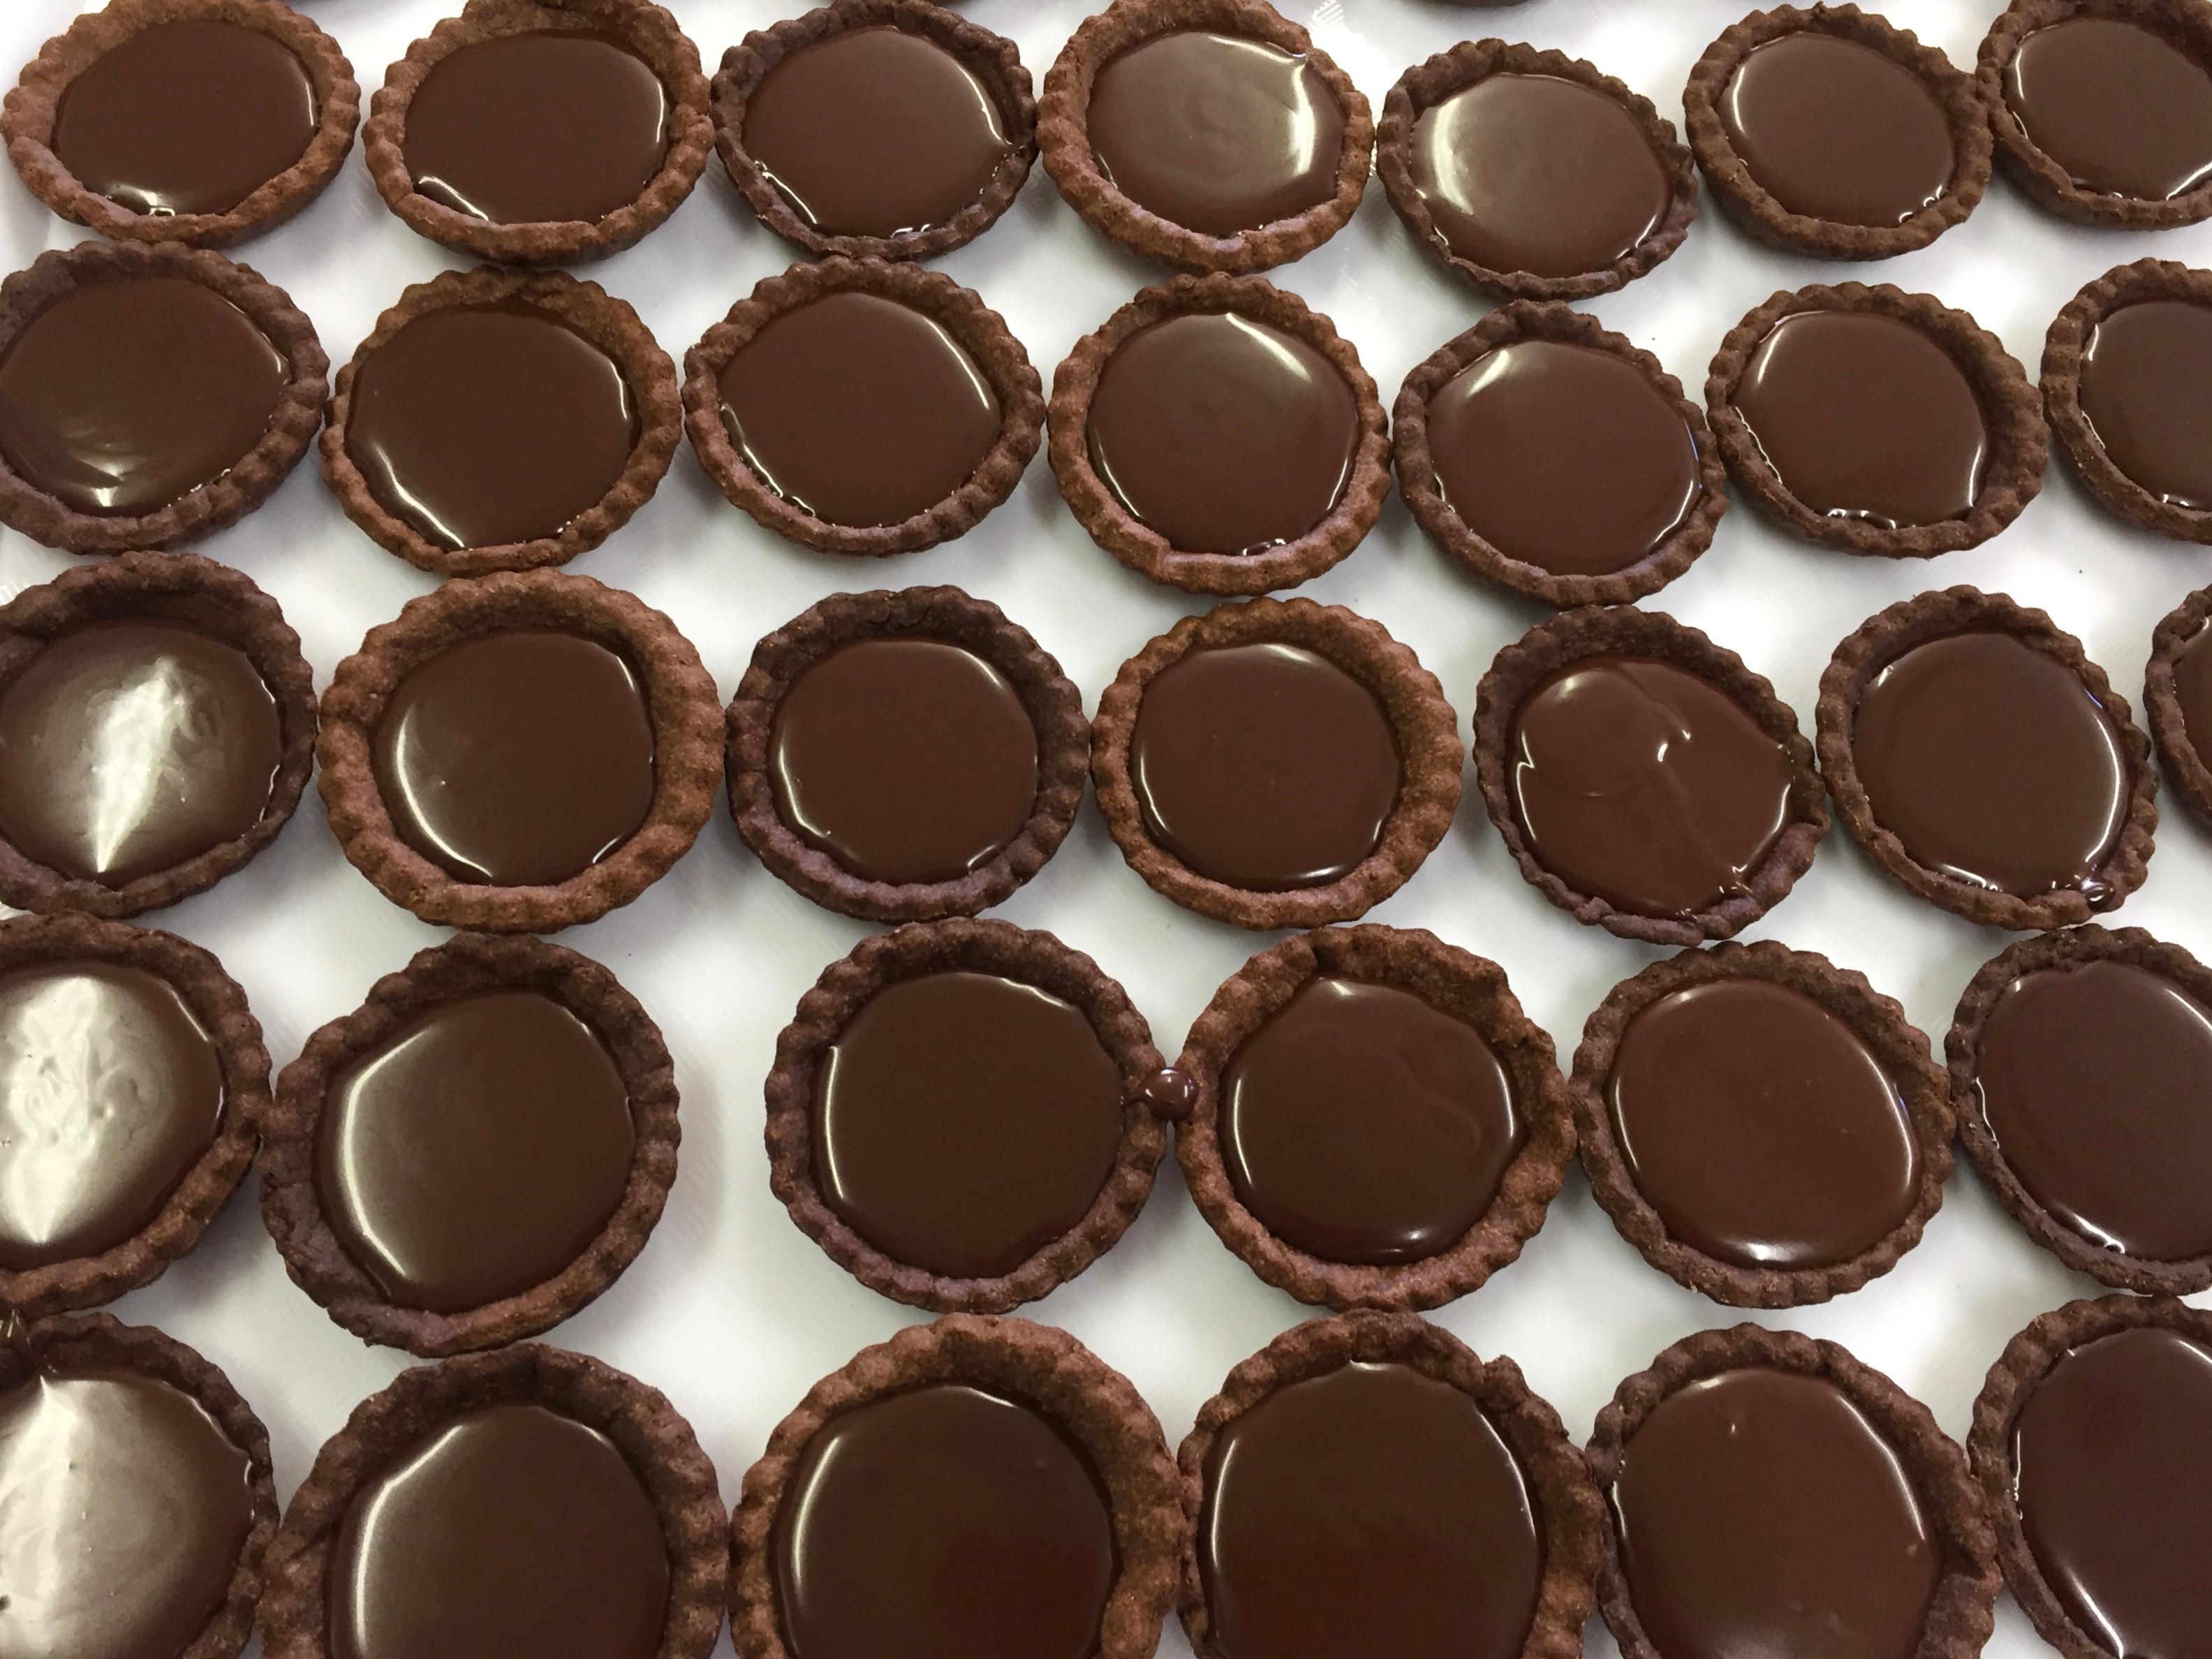 Chocolate Mocha Tarts - Gluten Free